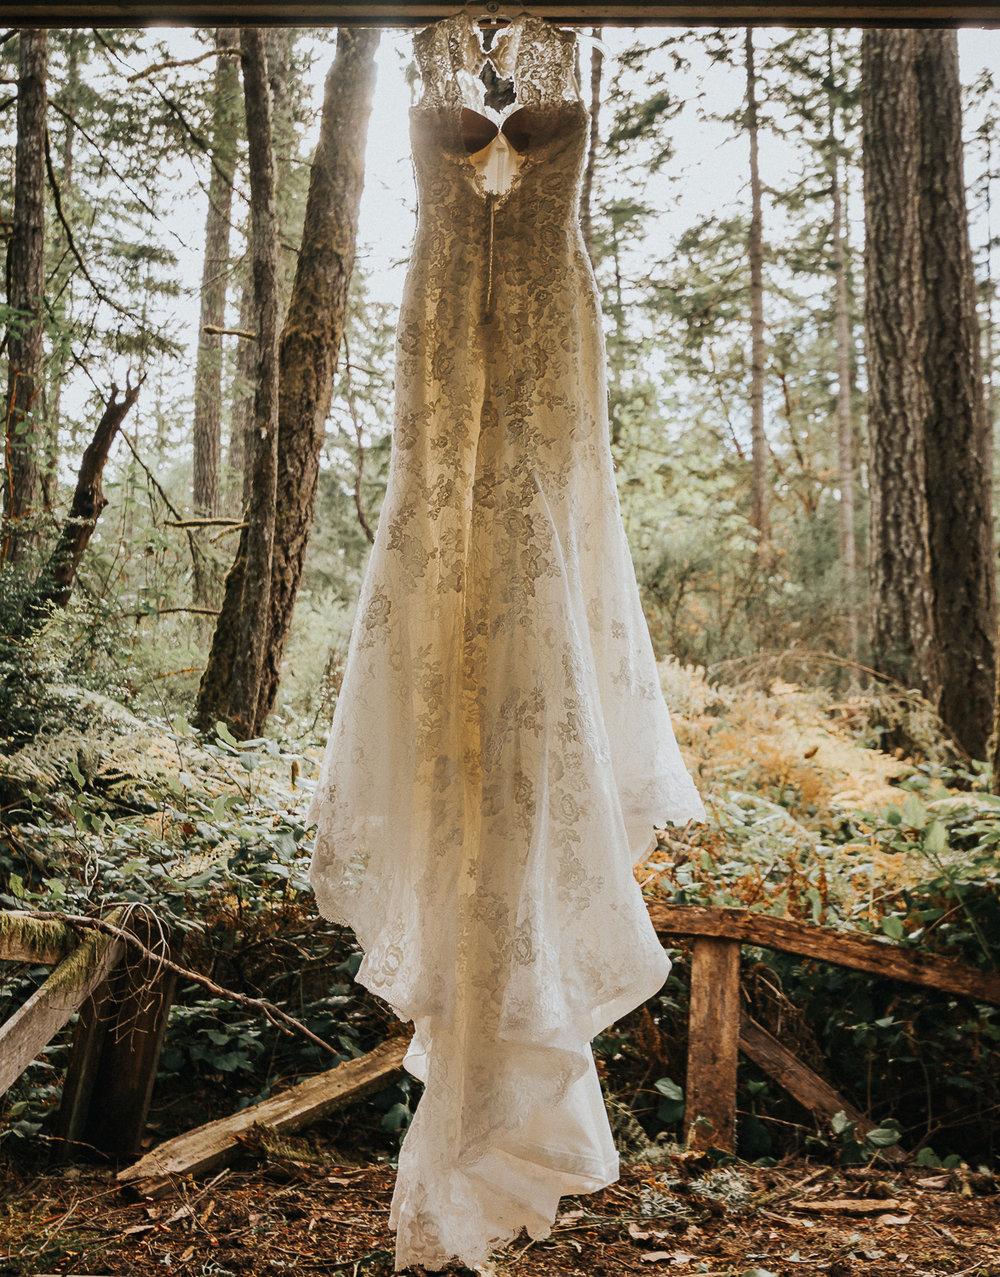 2cedarsphoto-rustic-forest-wedding-dress.jpg